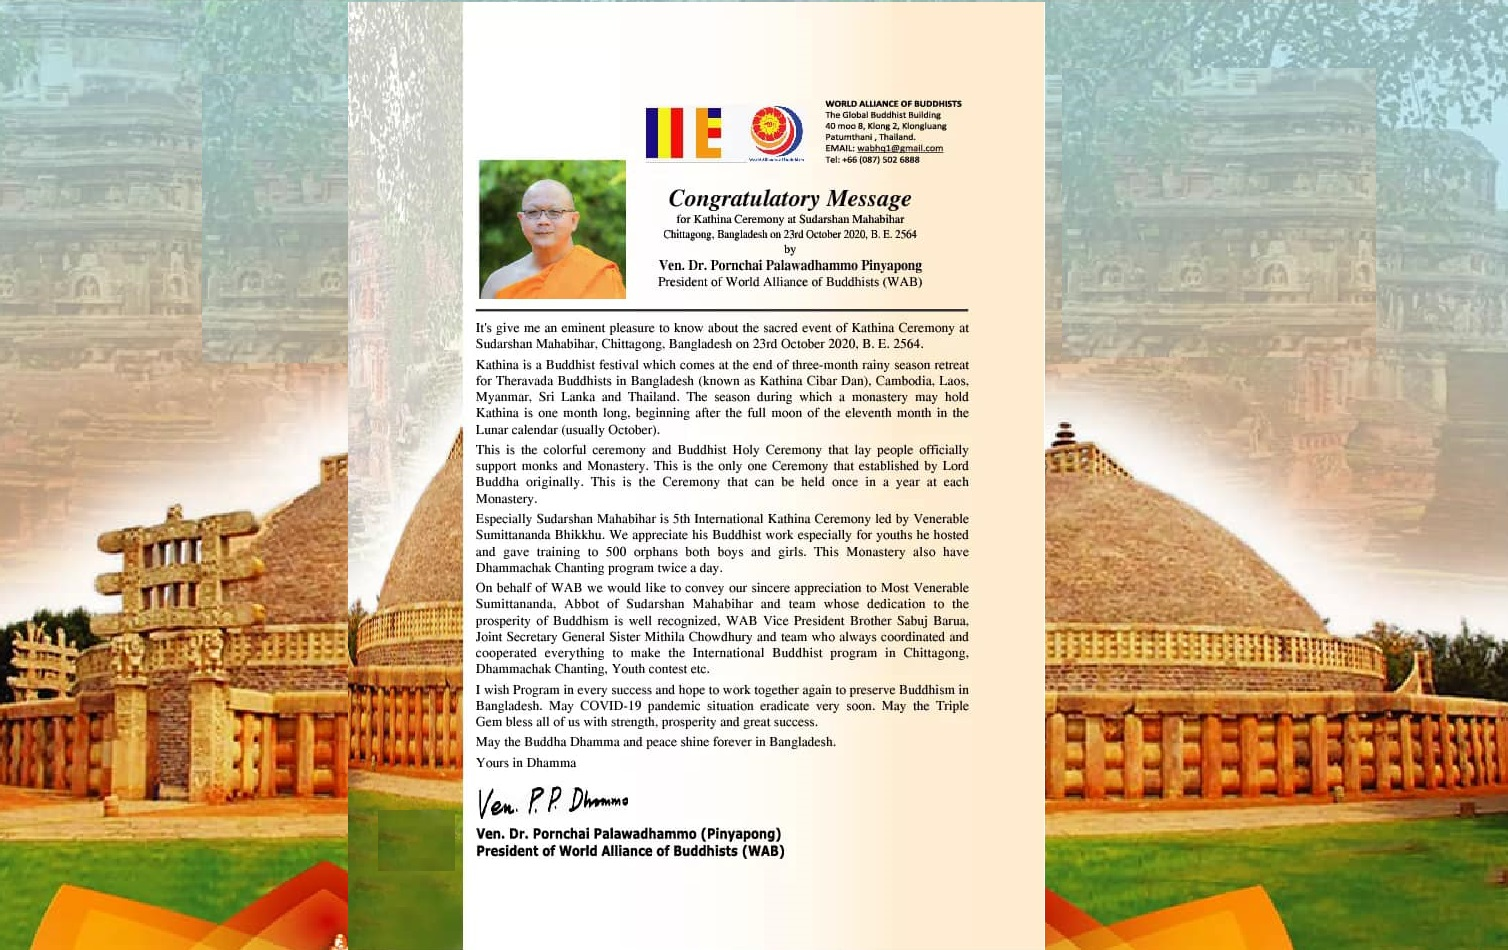 Congratulatory Message: Ven. Dr. Pornchai Palawadhammo Pinyapong President of World Alliance of Buddhists (WAB)